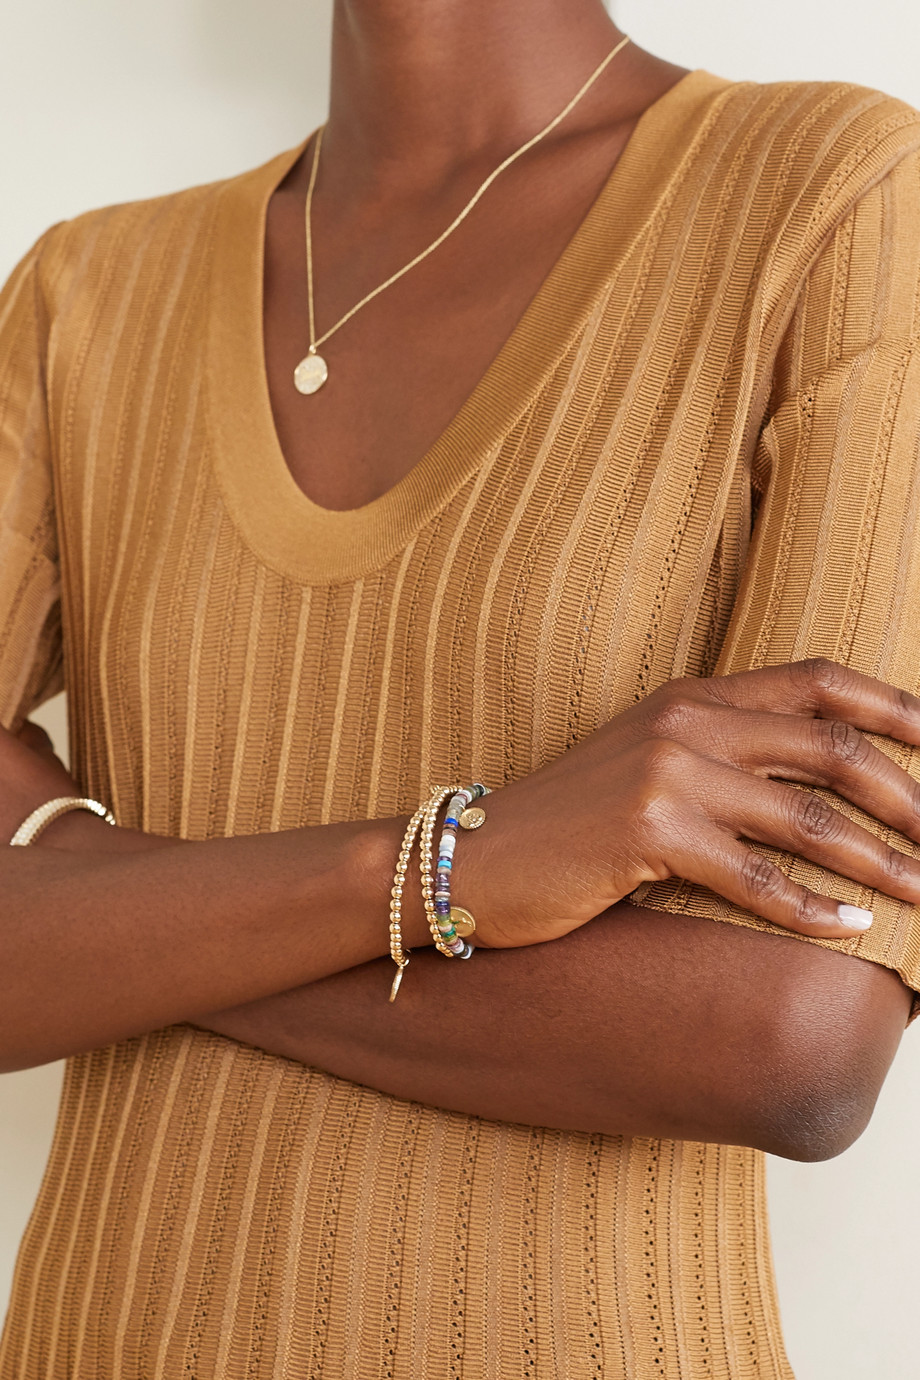 Sydney Evan 14-karat gold multi-stone bracelet